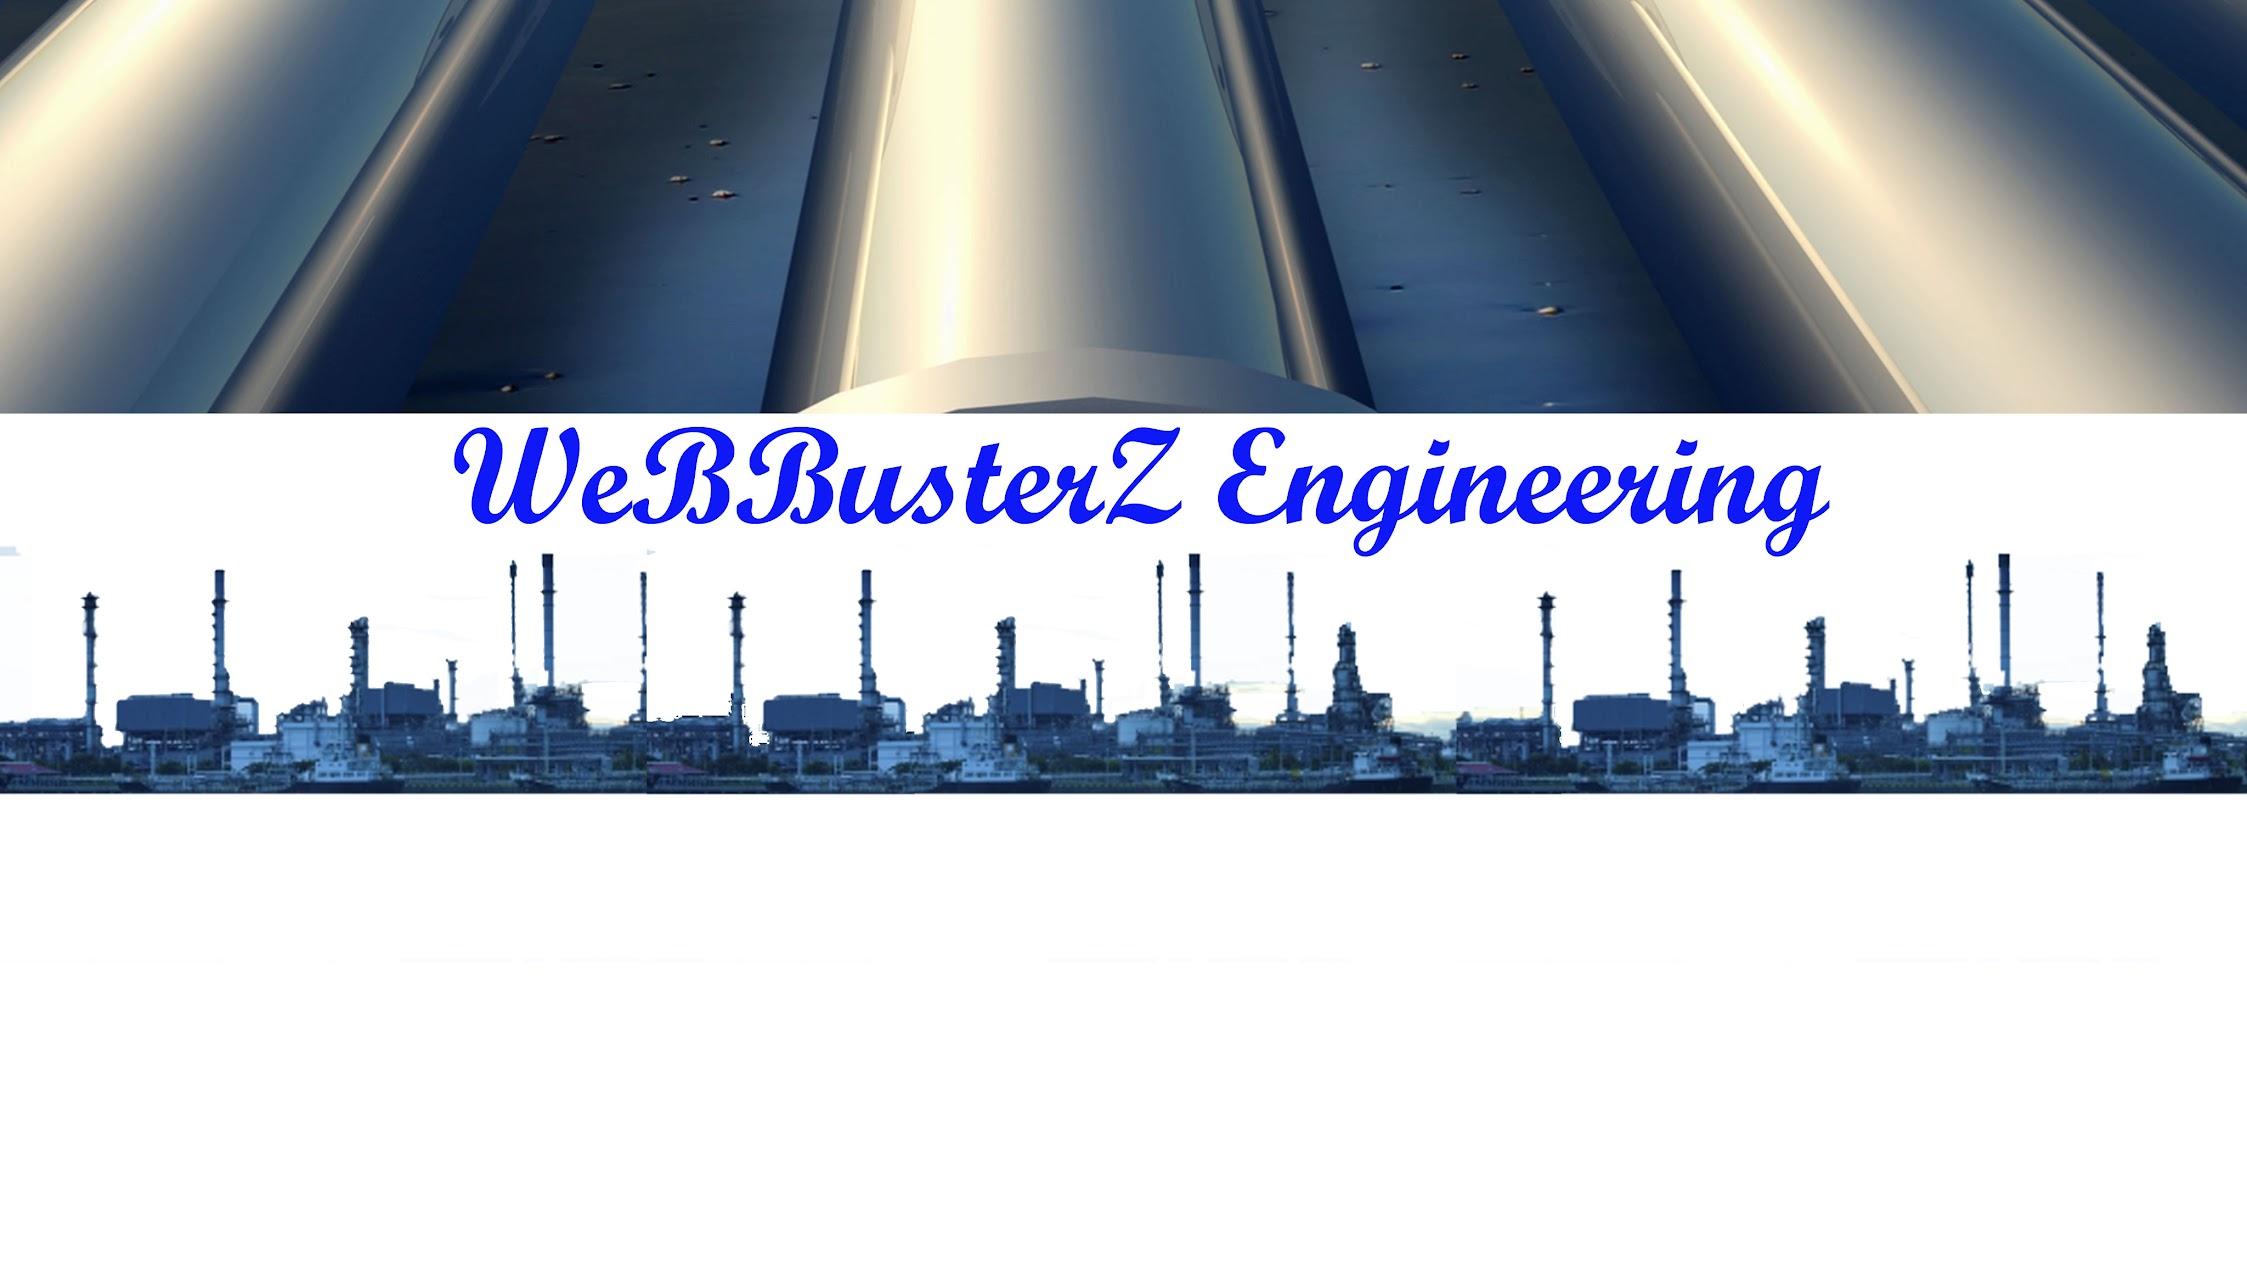 WeBBusterZ Engineering